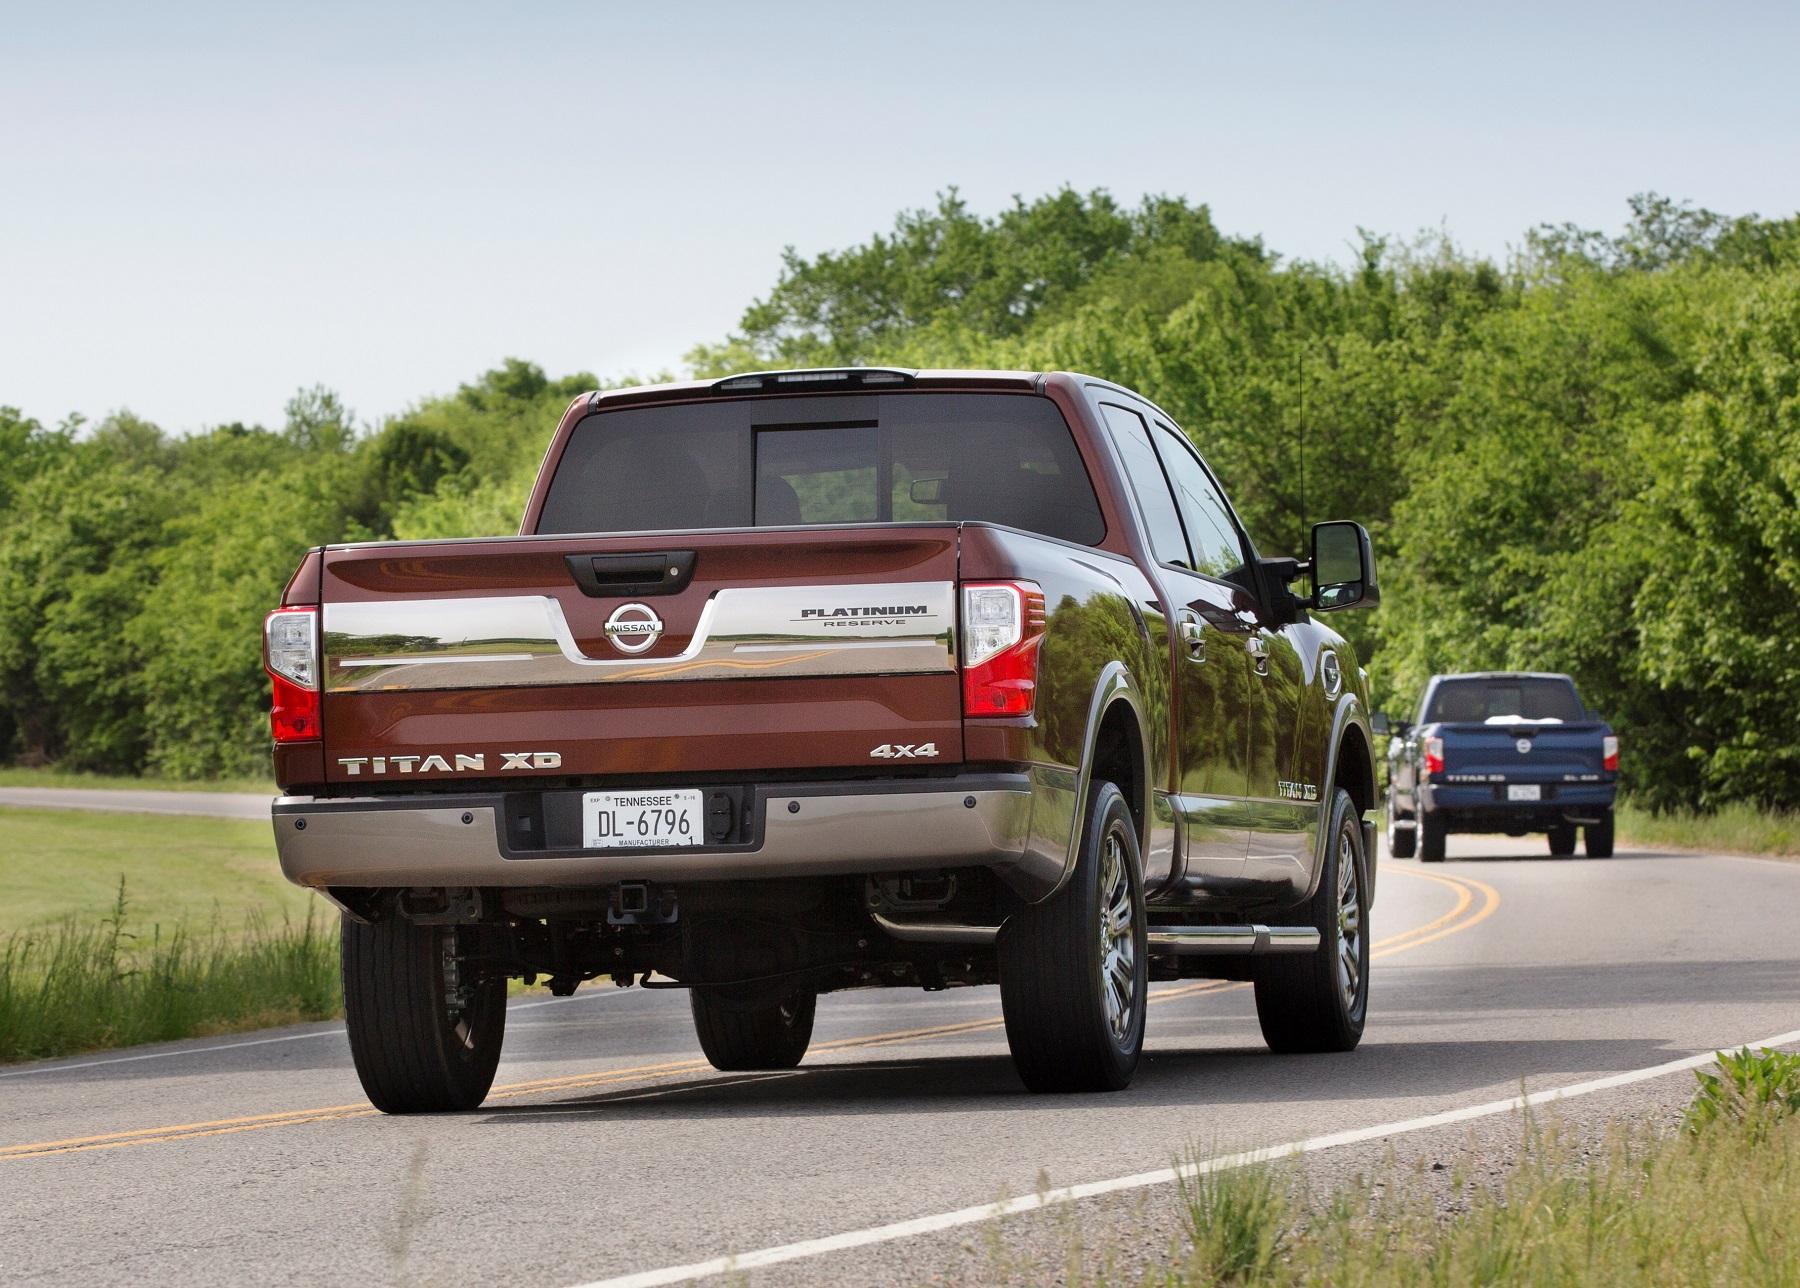 Nissan Titan XD Platinum Reserve V 8 Decked in Luxury CarHub